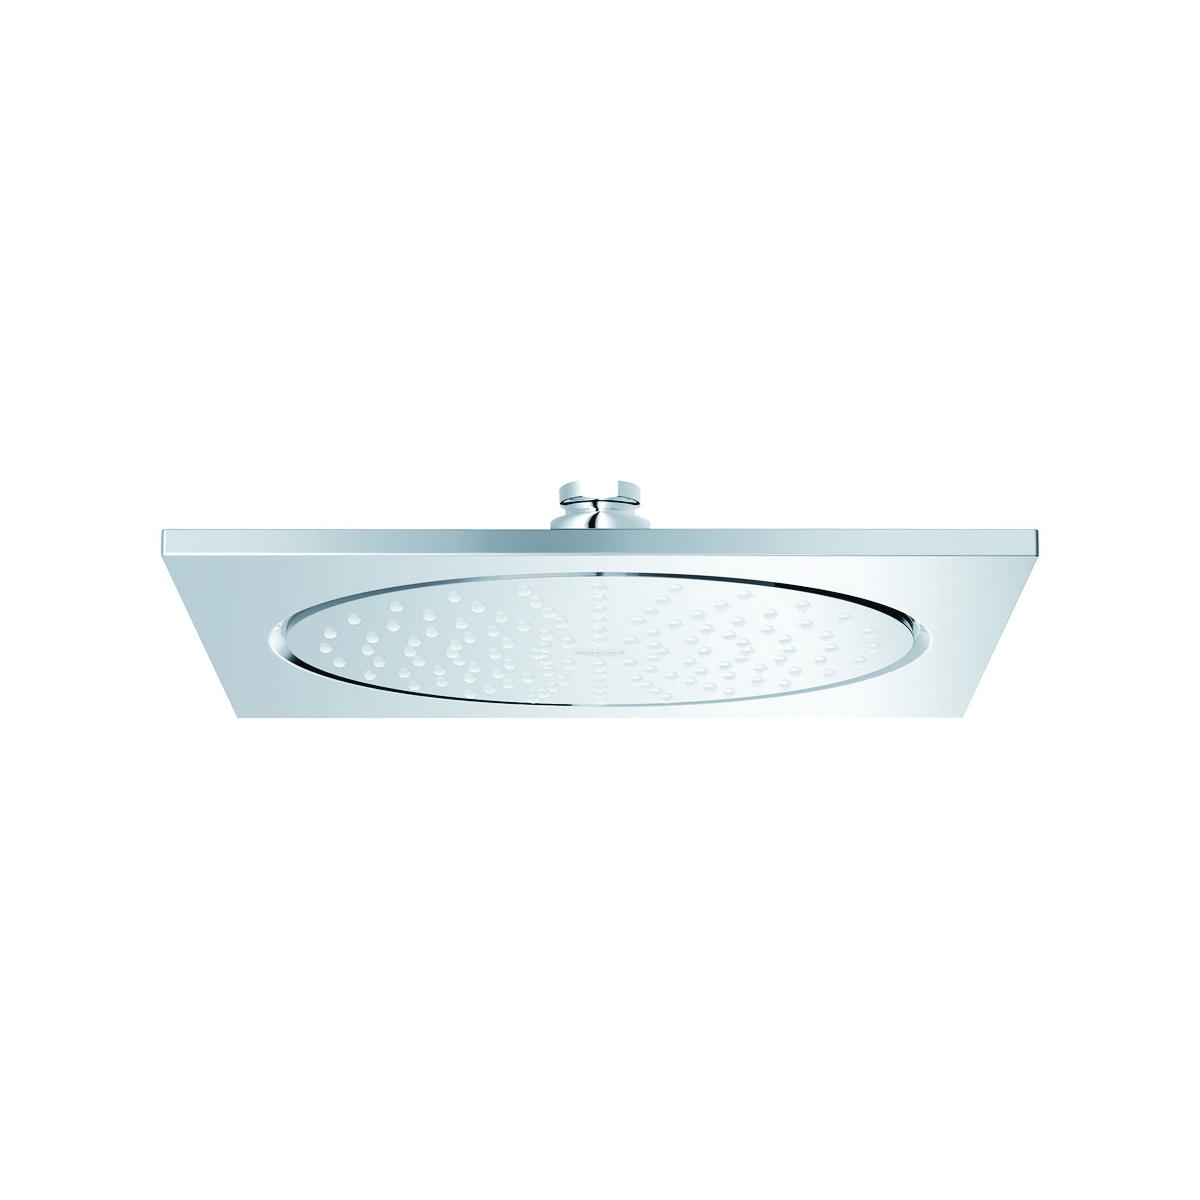 GROHE 27285000 Rainshower® Shower Head, 2.4 gpm, 1 Spray, Ceiling Mount, Import